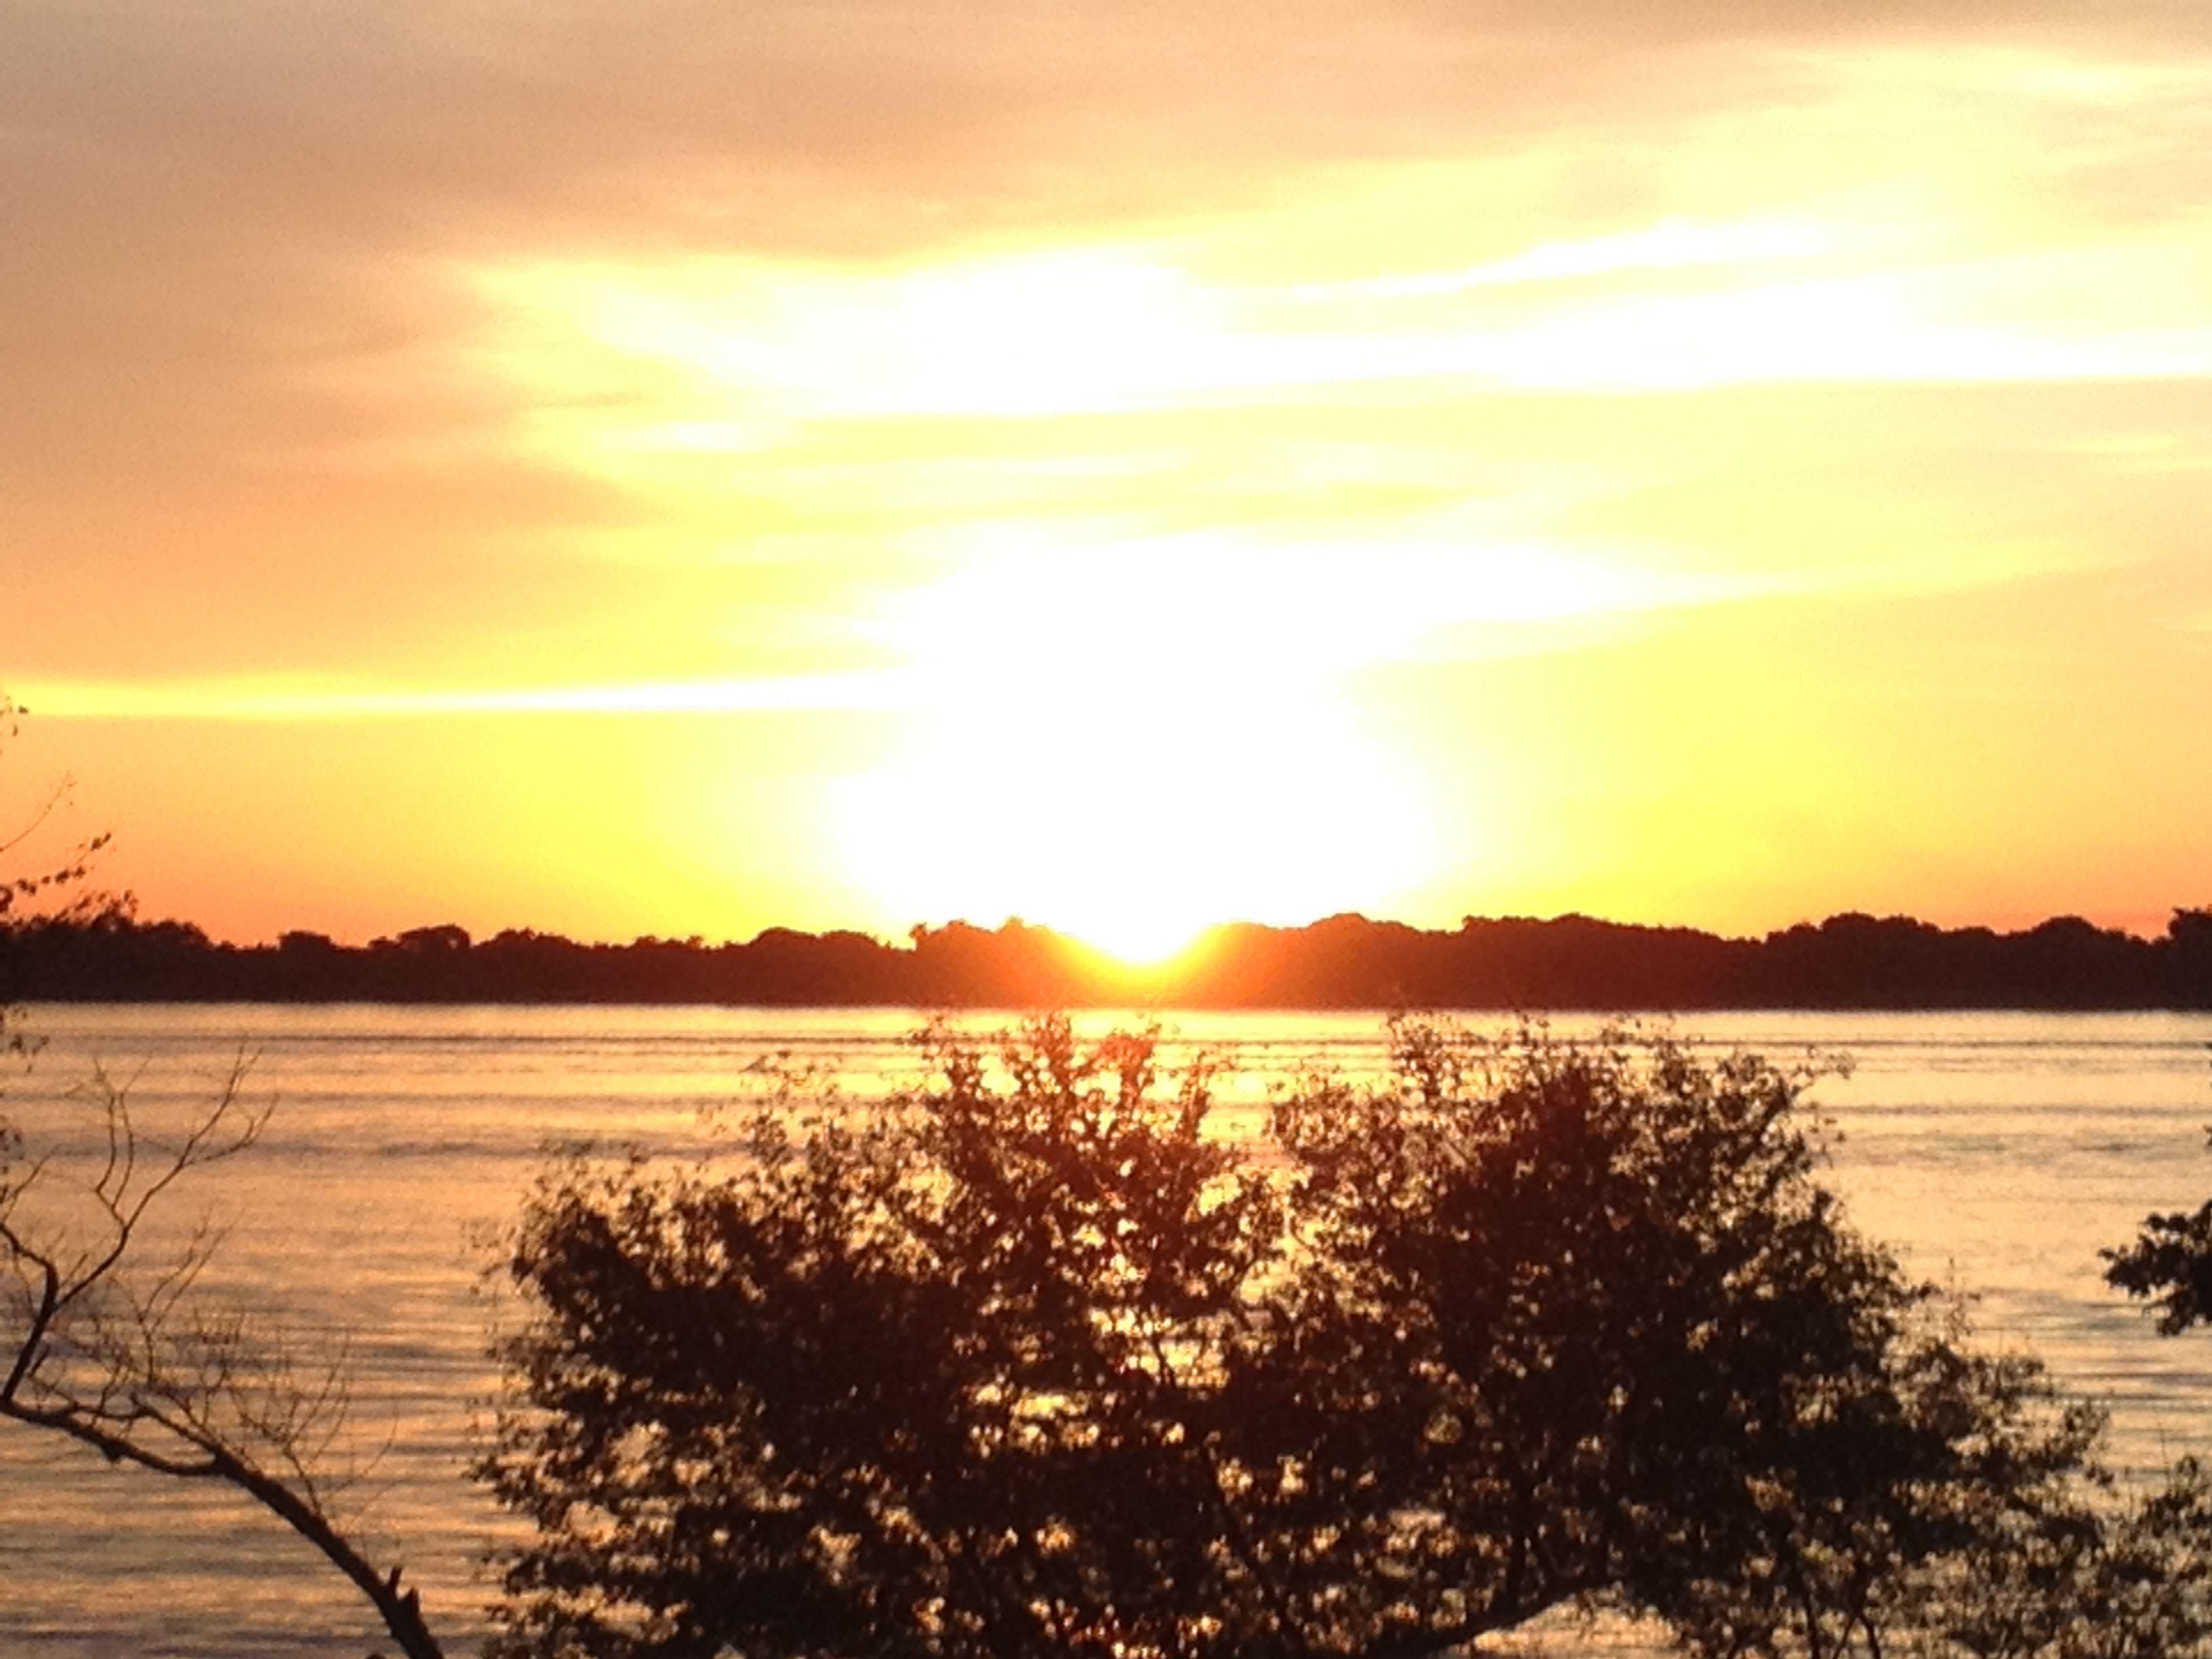 Sunset Gasômetro - Abril 2014